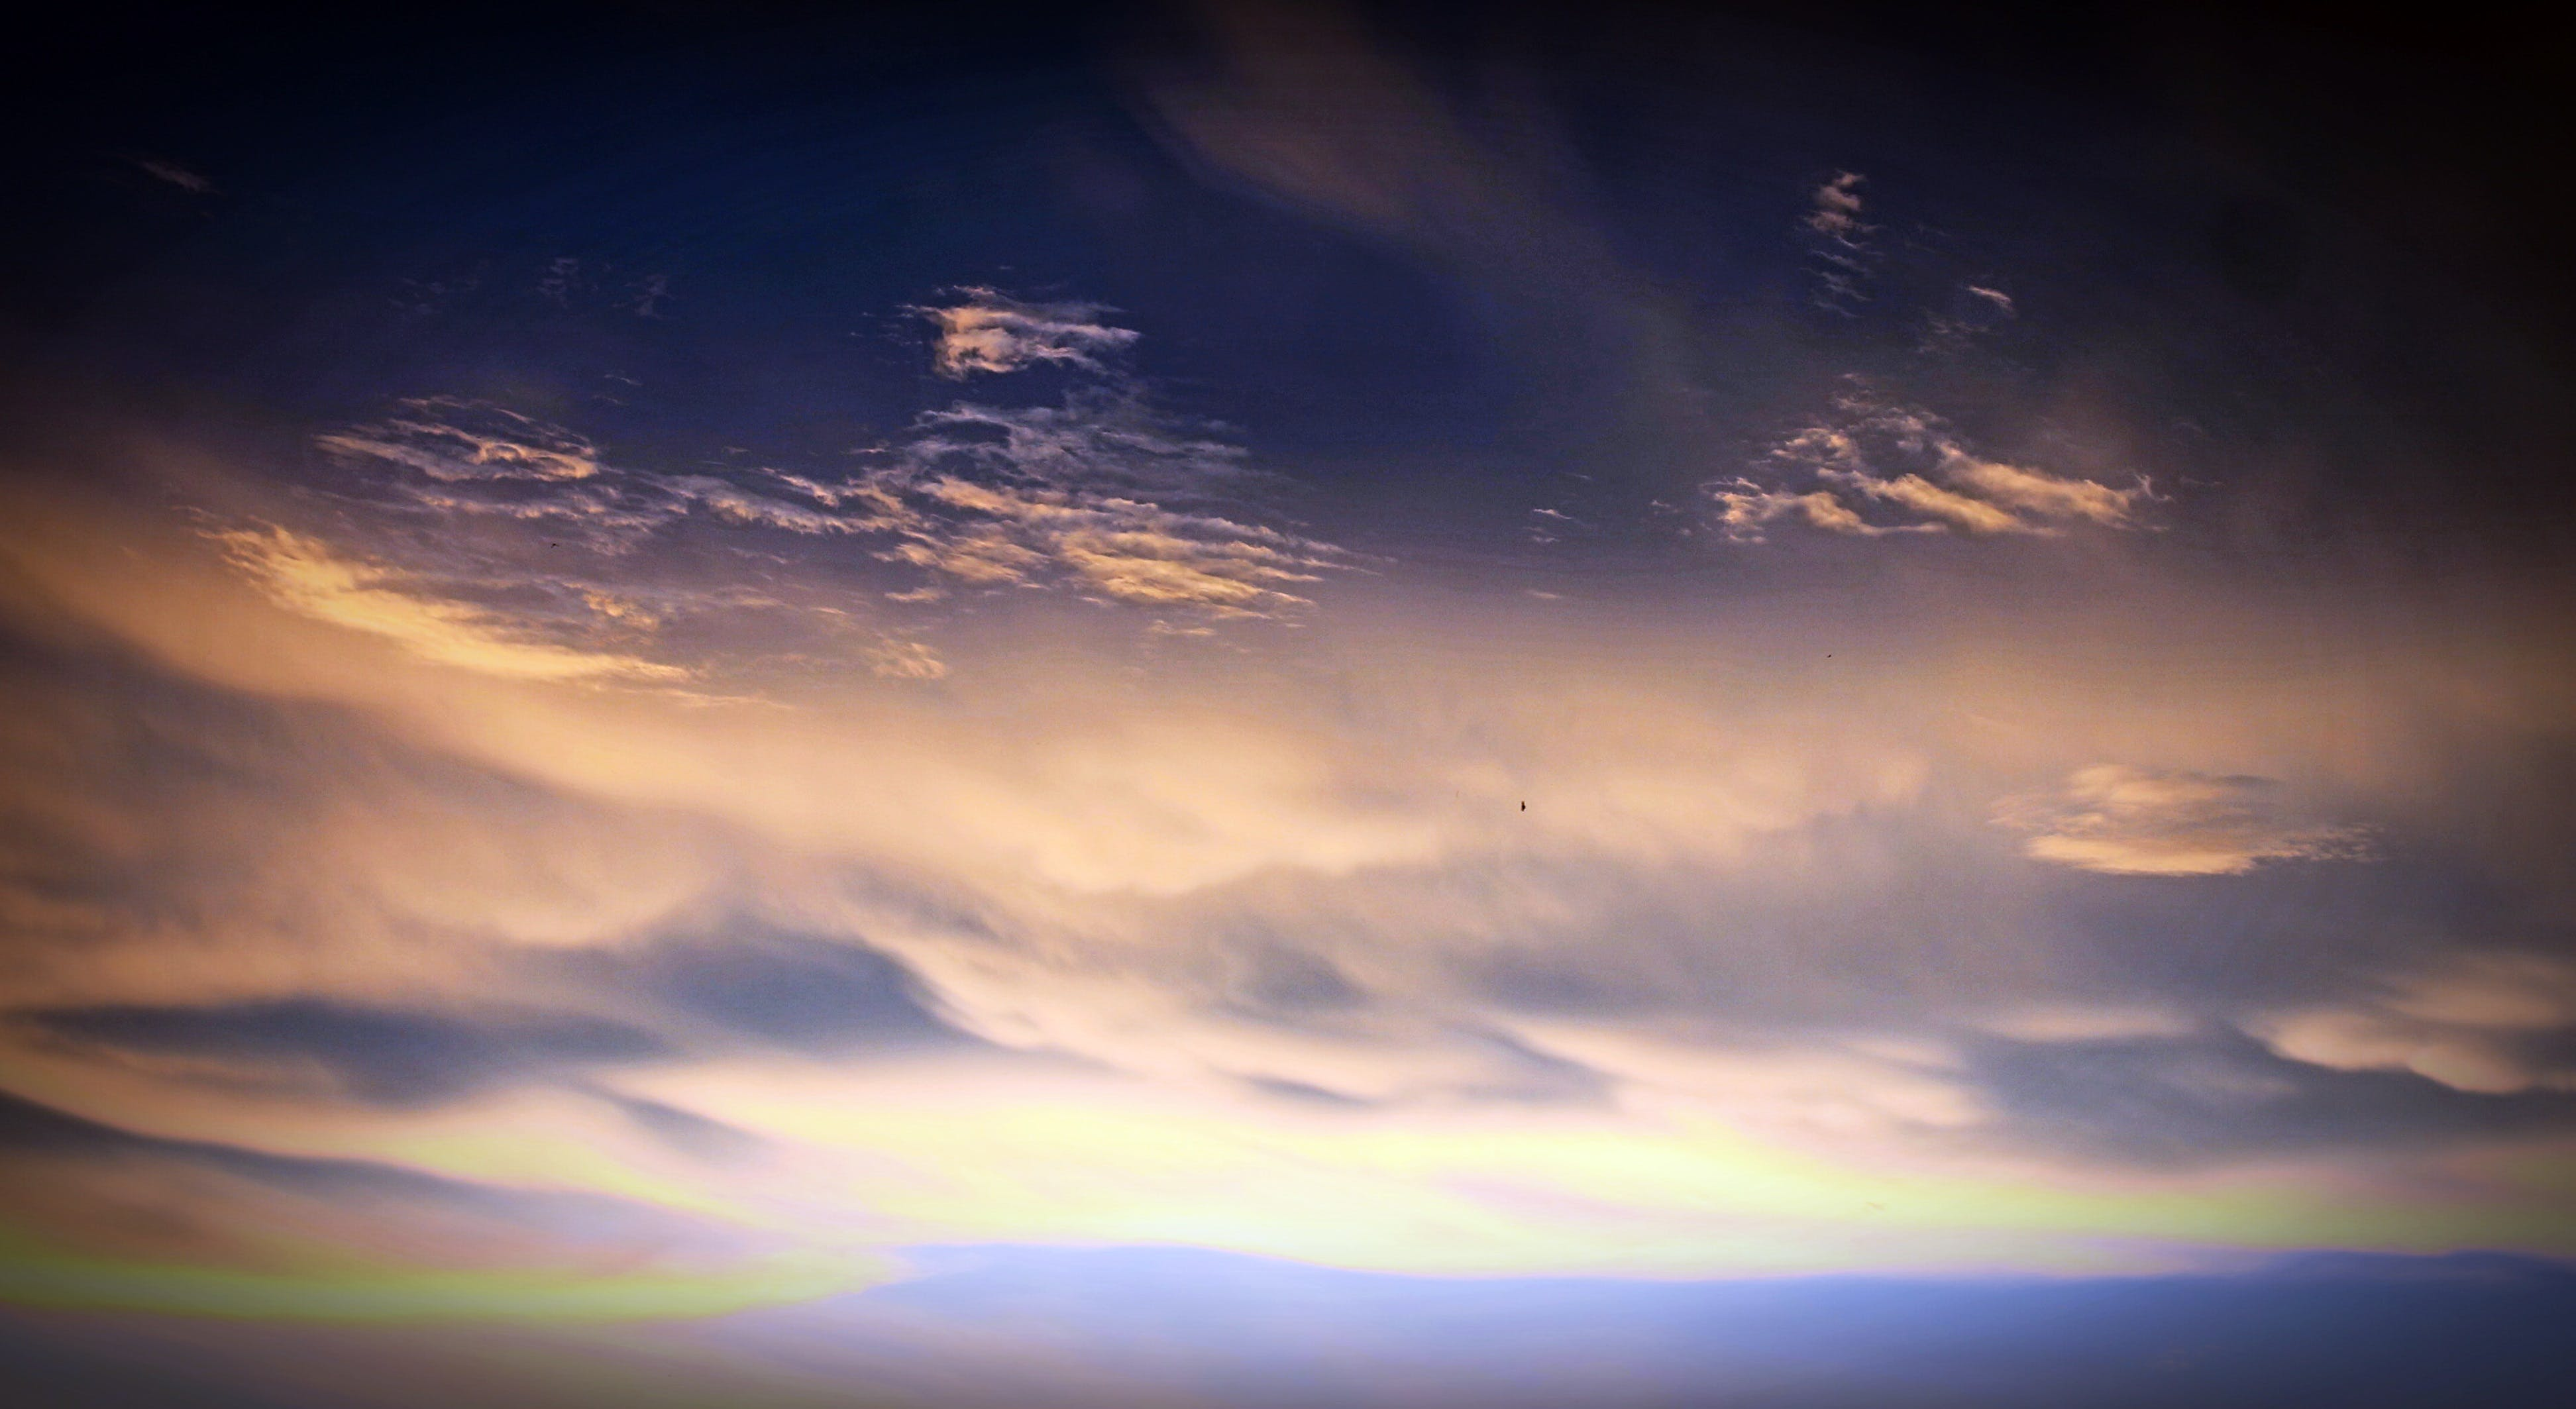 alto, amanecer, bonito